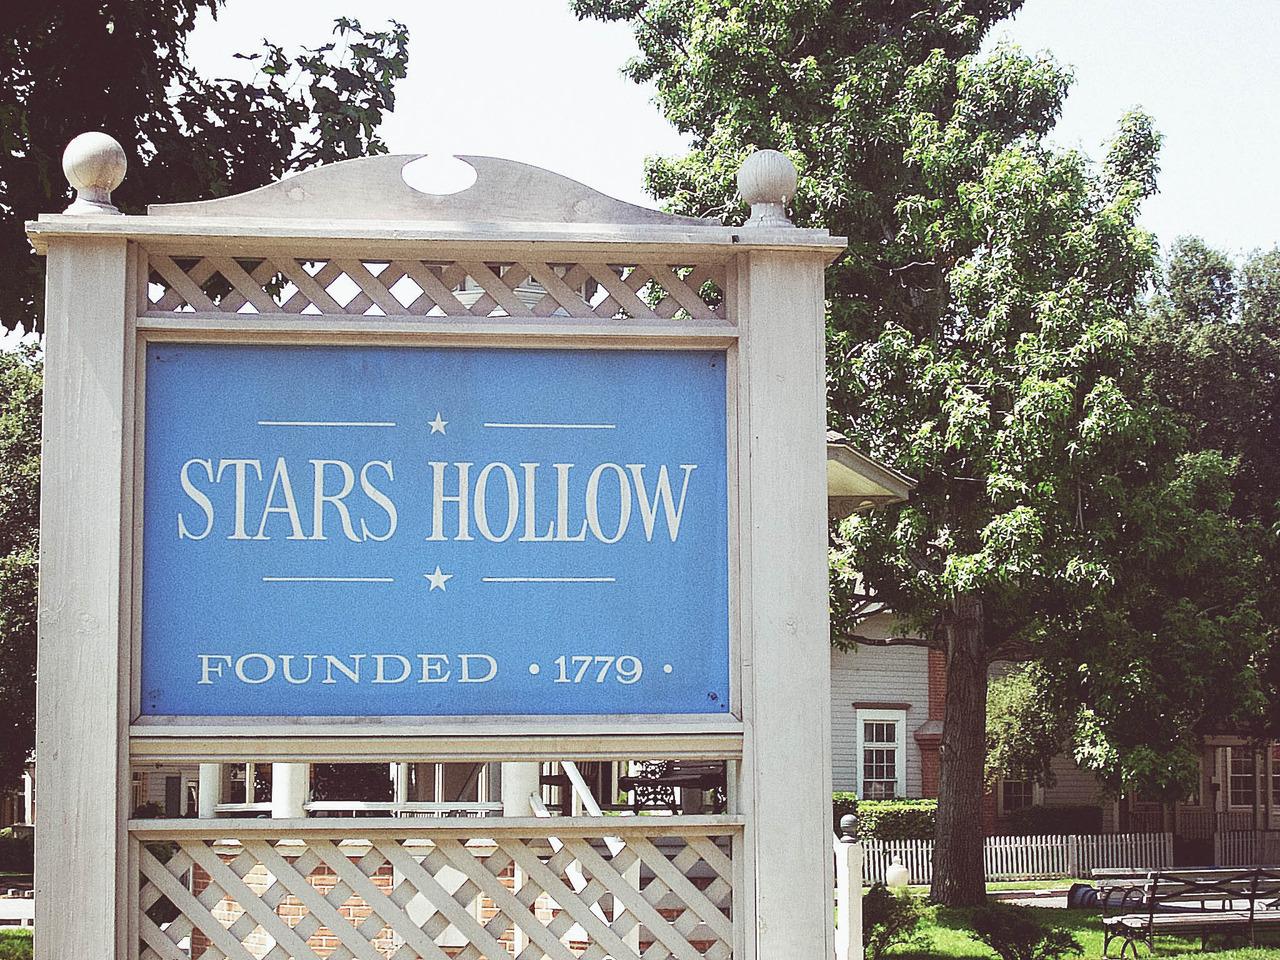 https://i1.wp.com/ndsuspectrum.com/wp-content/uploads/2016/10/Stars-Hollow_Sierra-Shupe.jpg